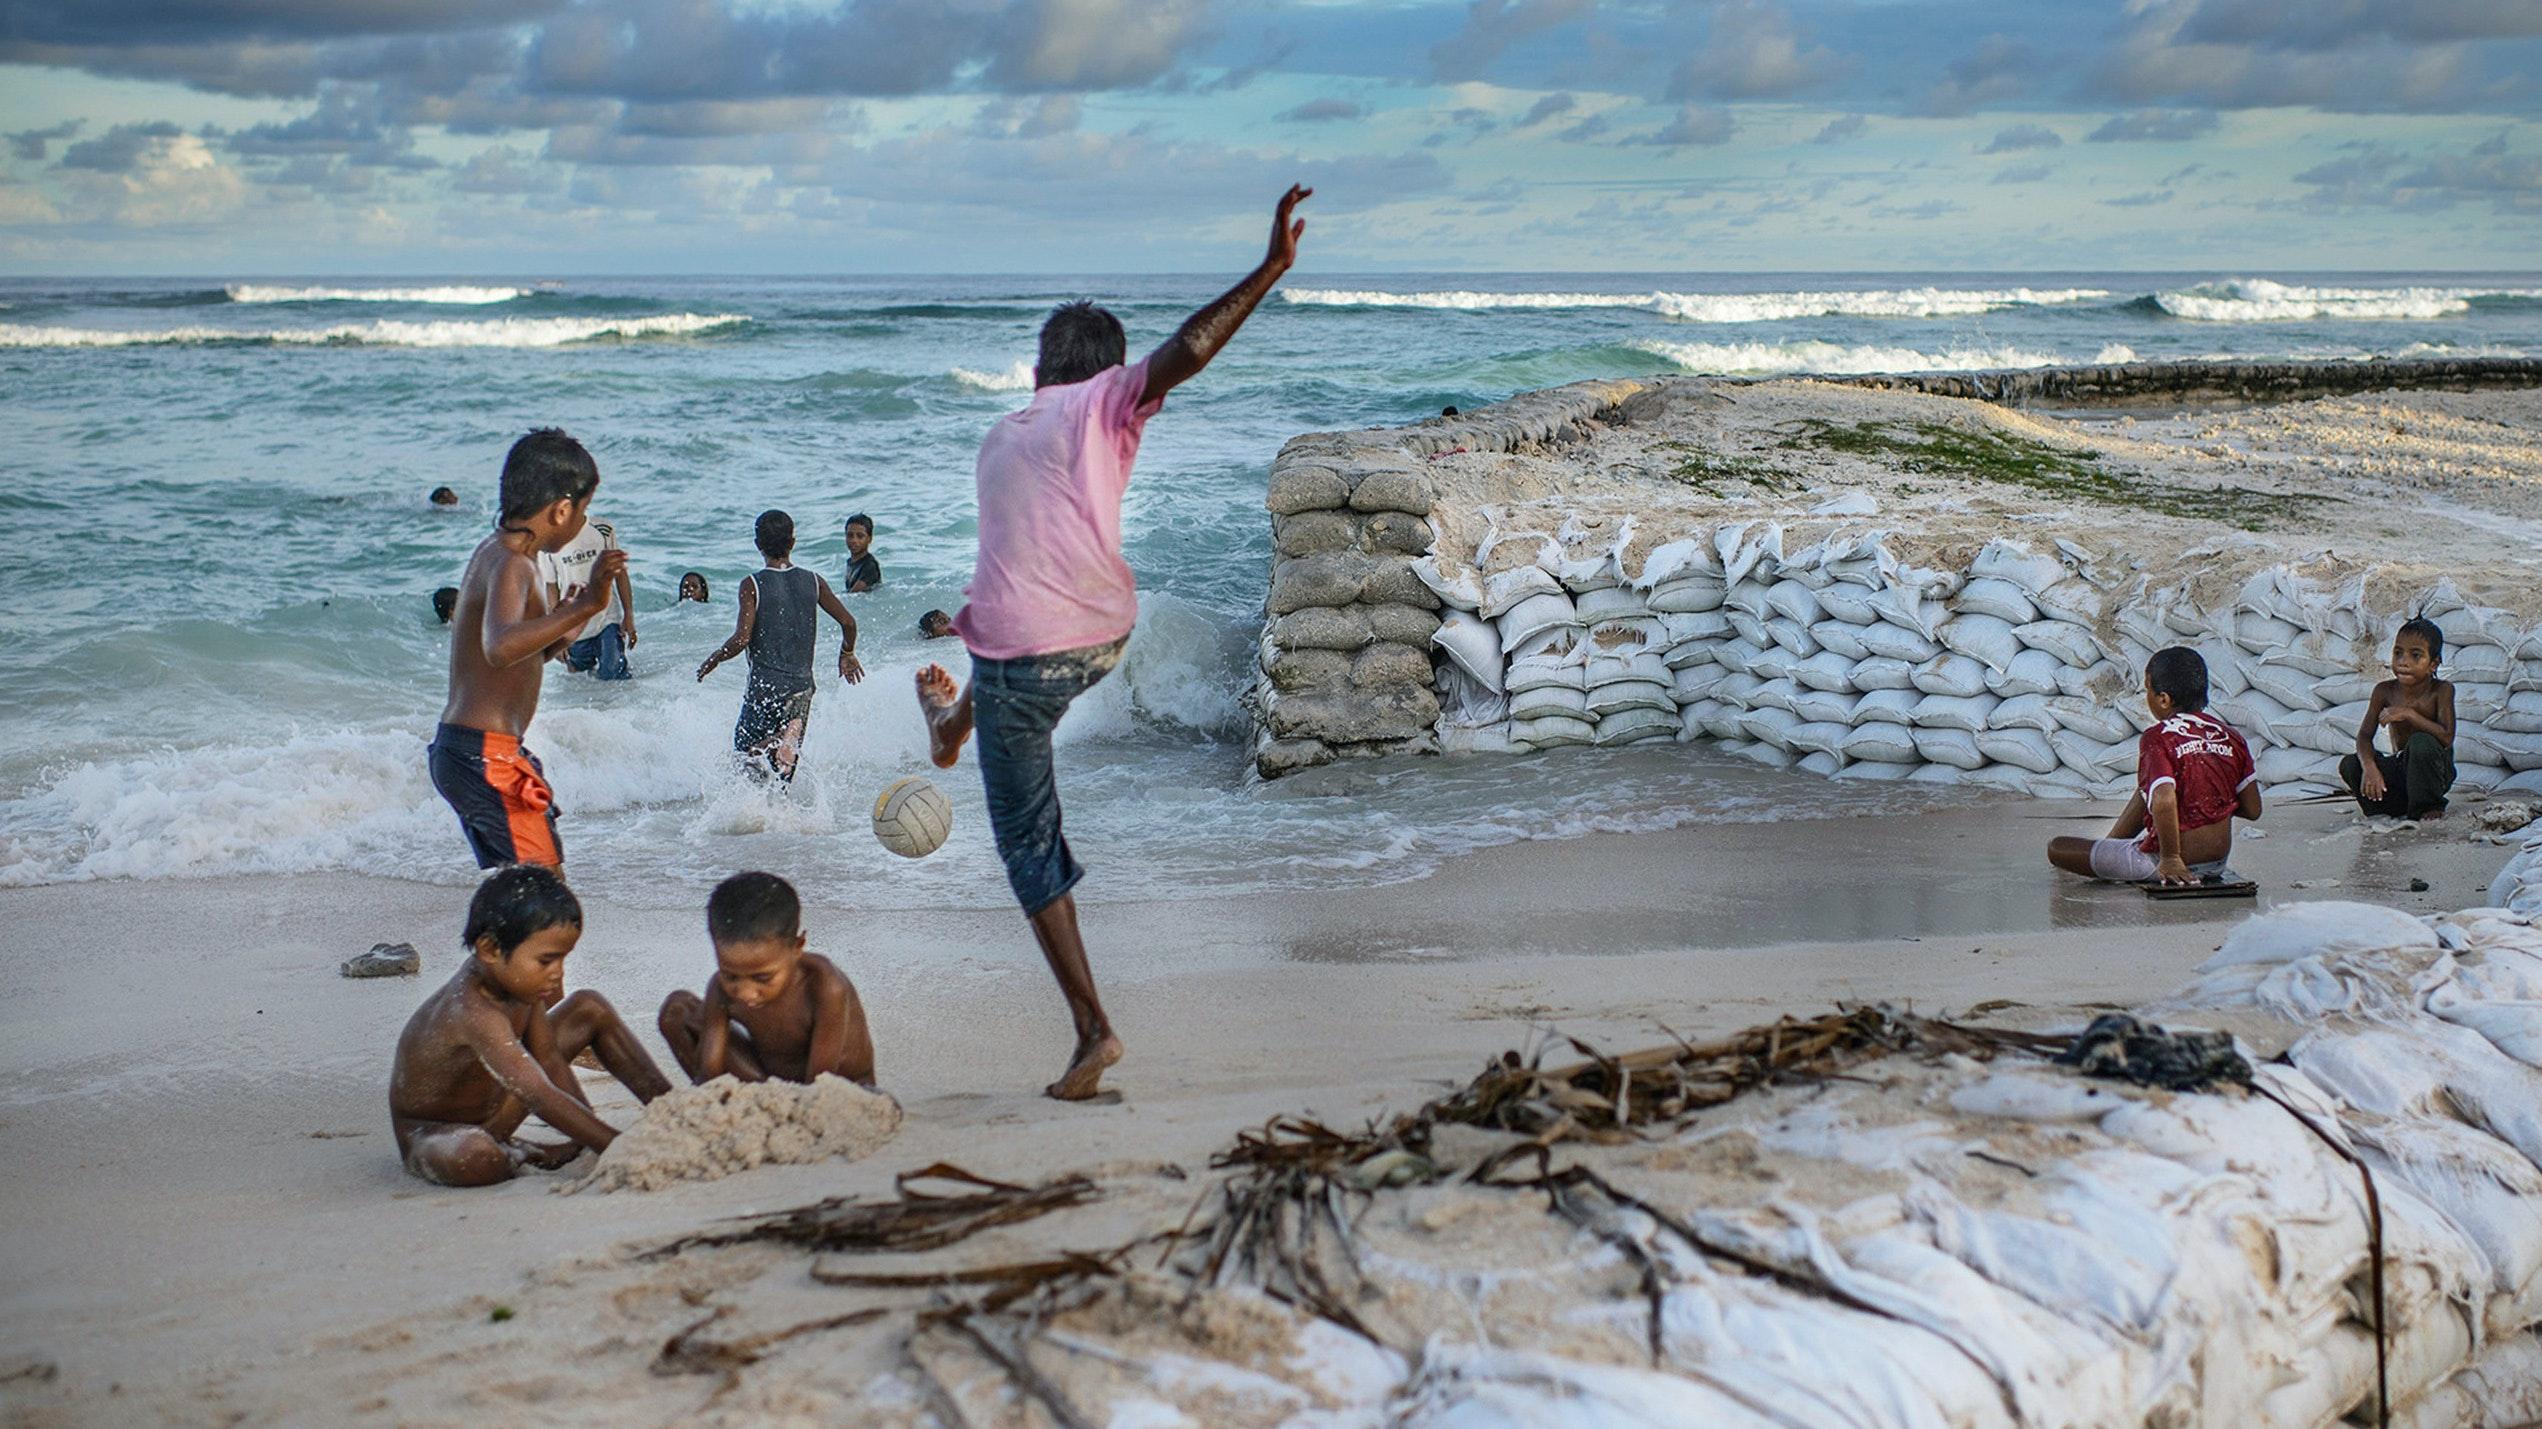 Kids playing on a beach